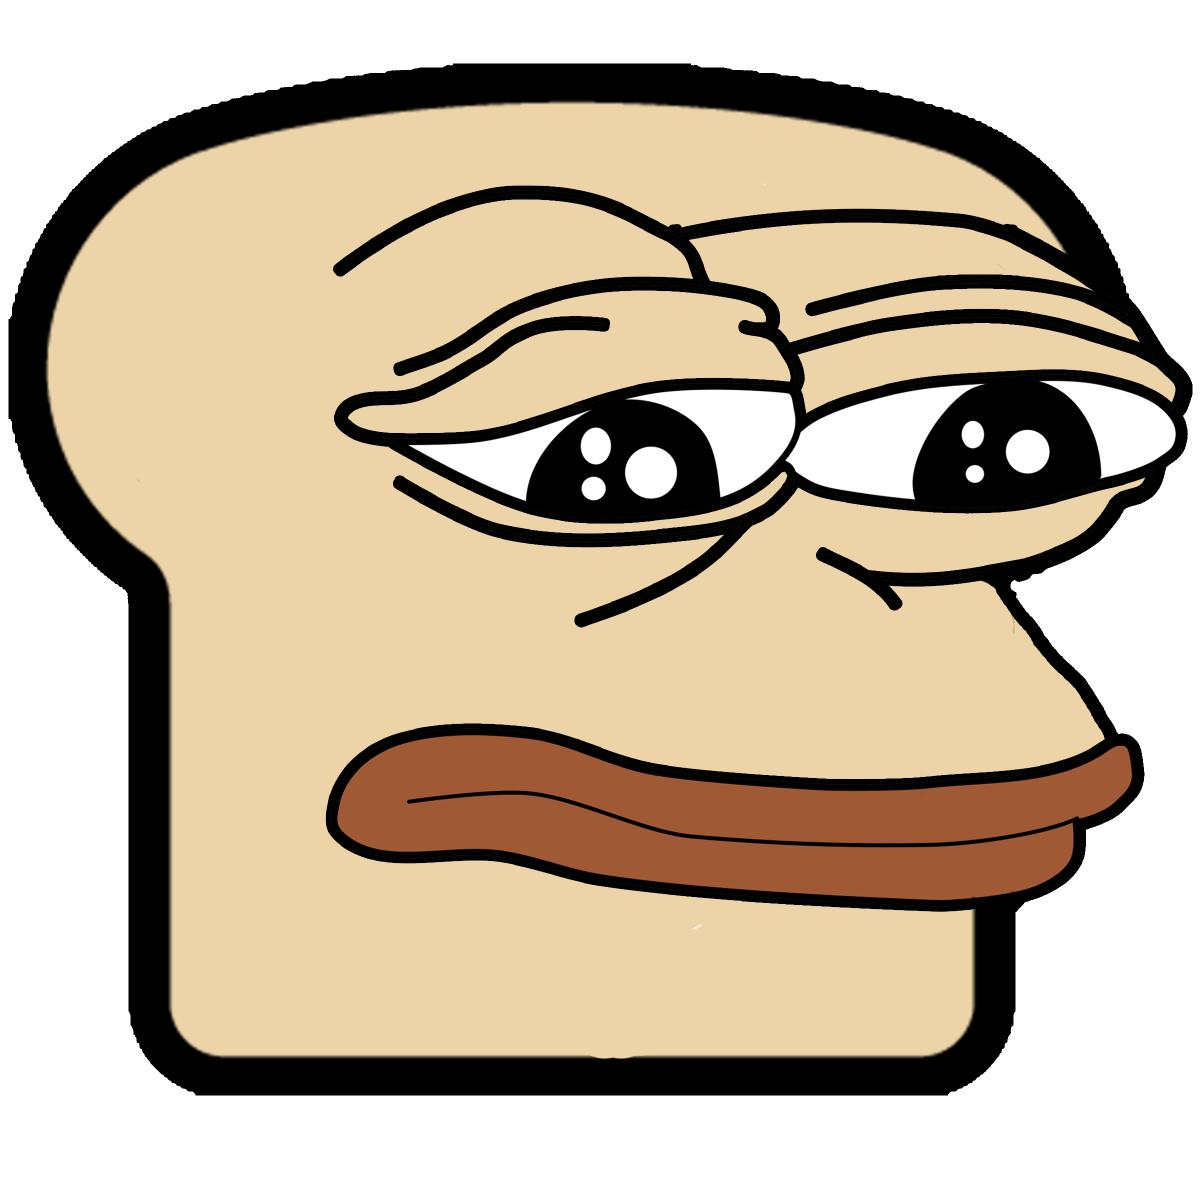 Disguised Toast on Twitter: